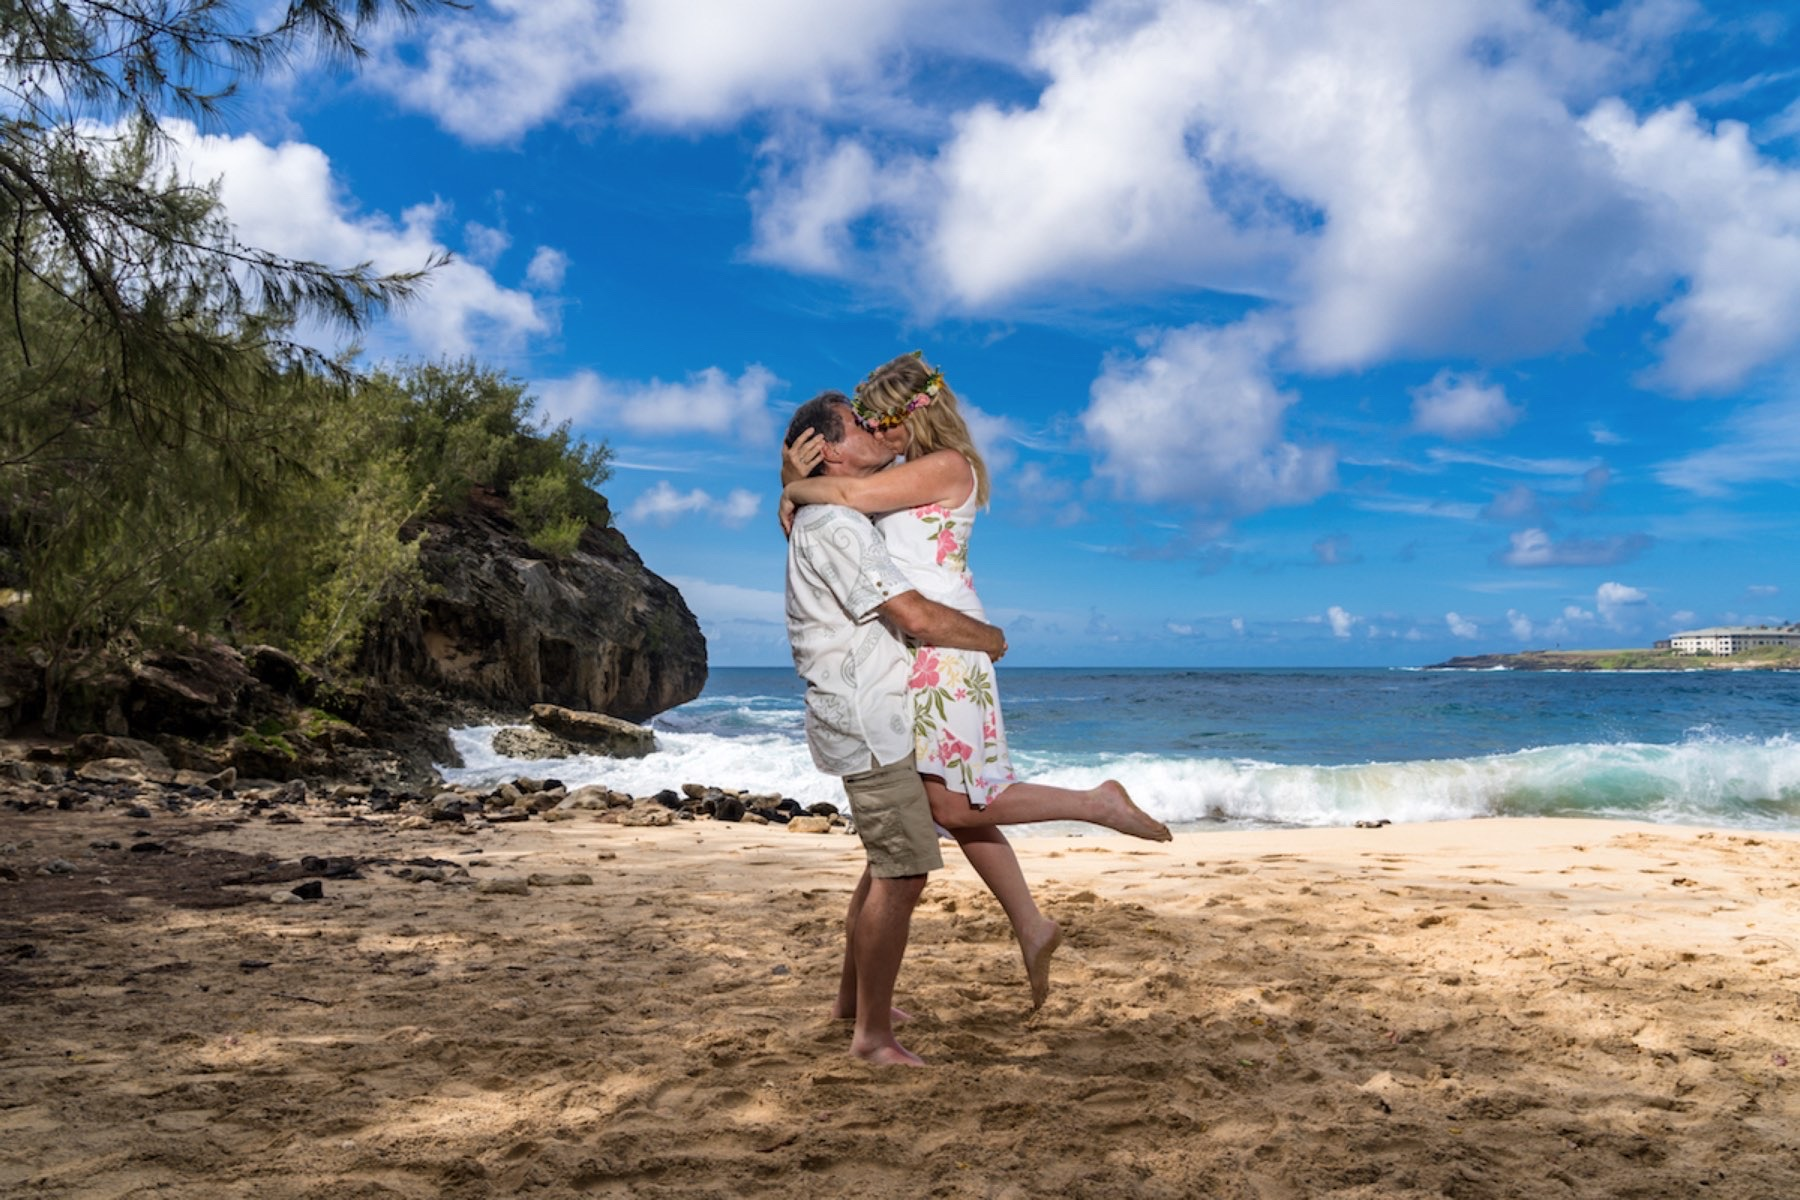 Paula & Eric on the beach in Hawaii.